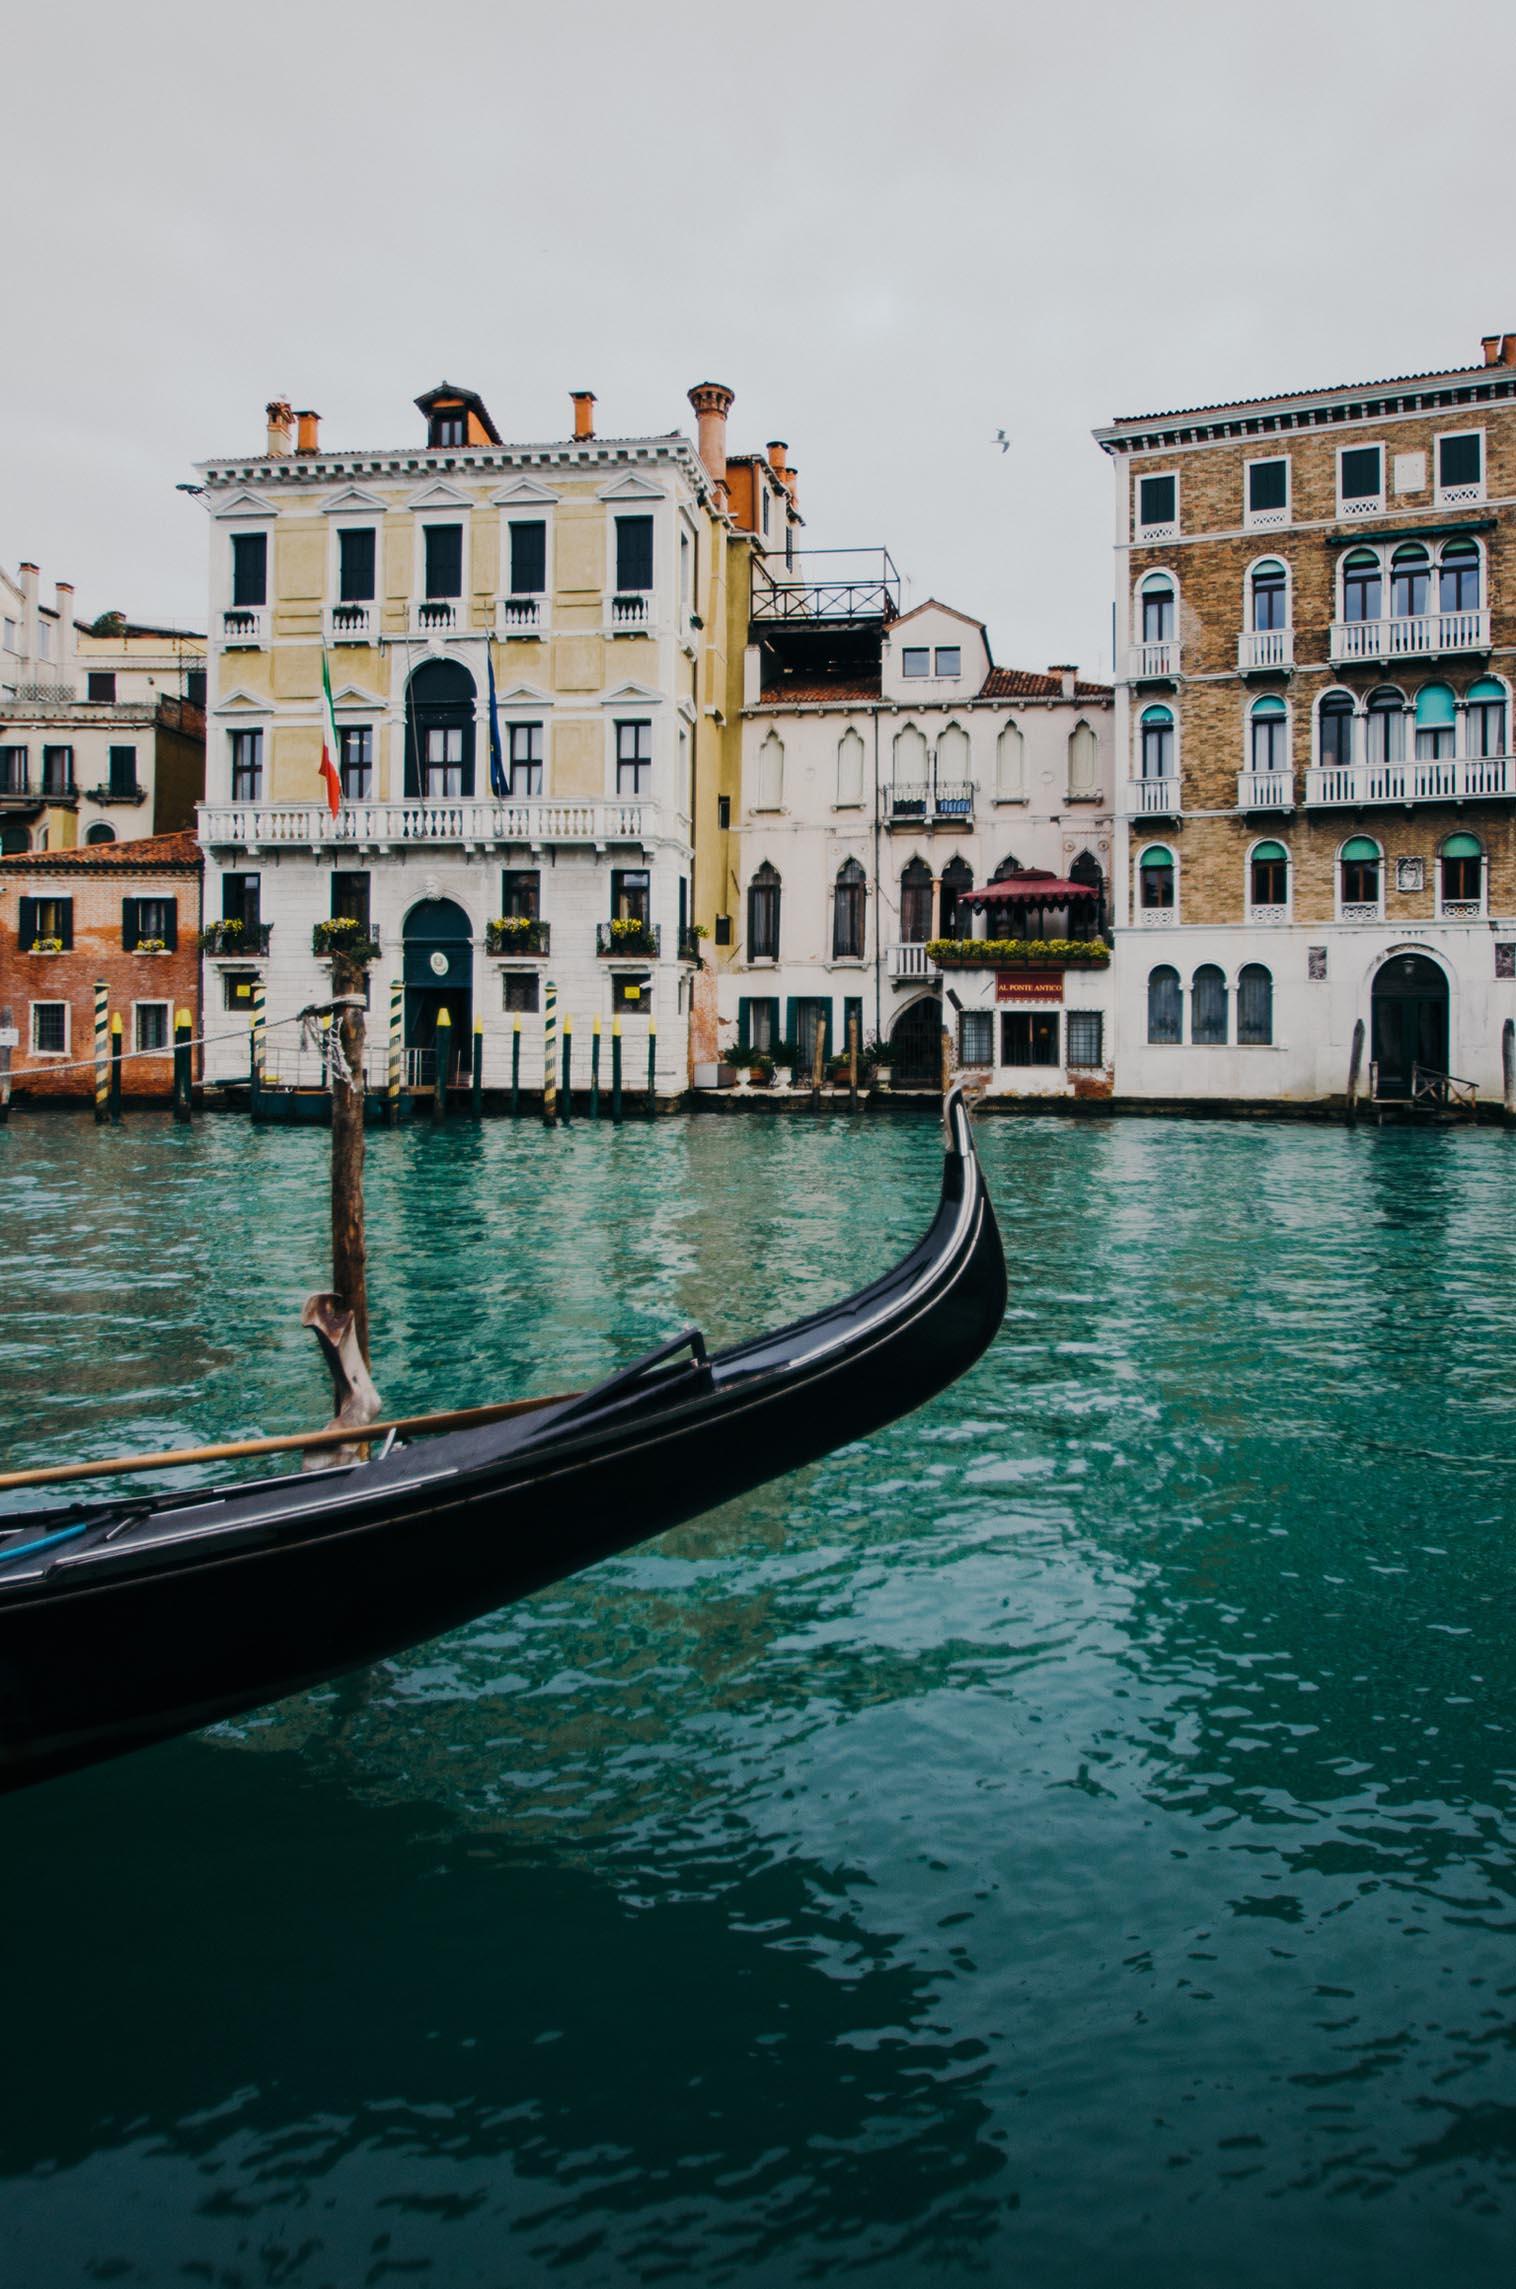 AdamSzafranski-Venice-Italy-09.jpg